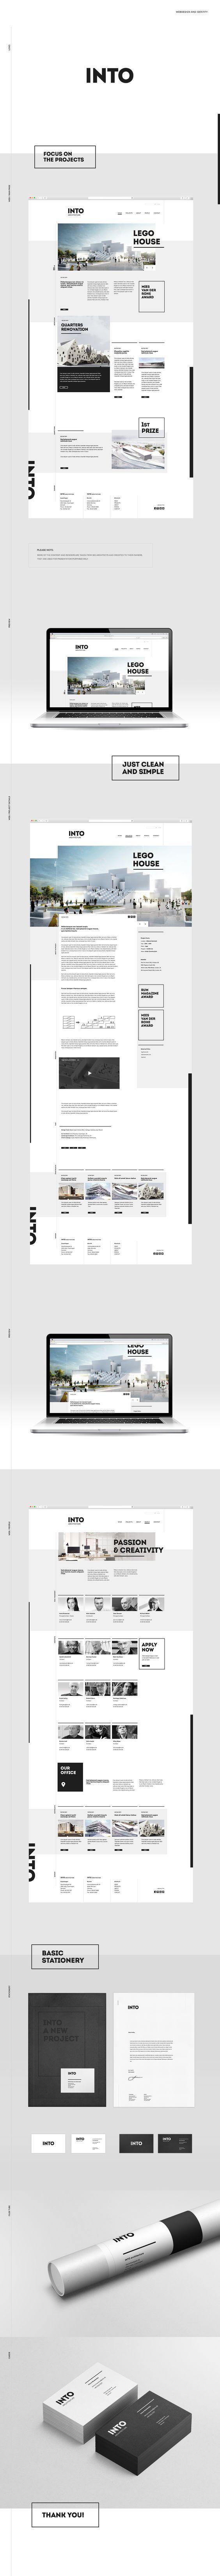 Simple Clean Minimalist Website Collection. Get similar web… Latest News & Trends on #webdesign | http://webworksagency.com